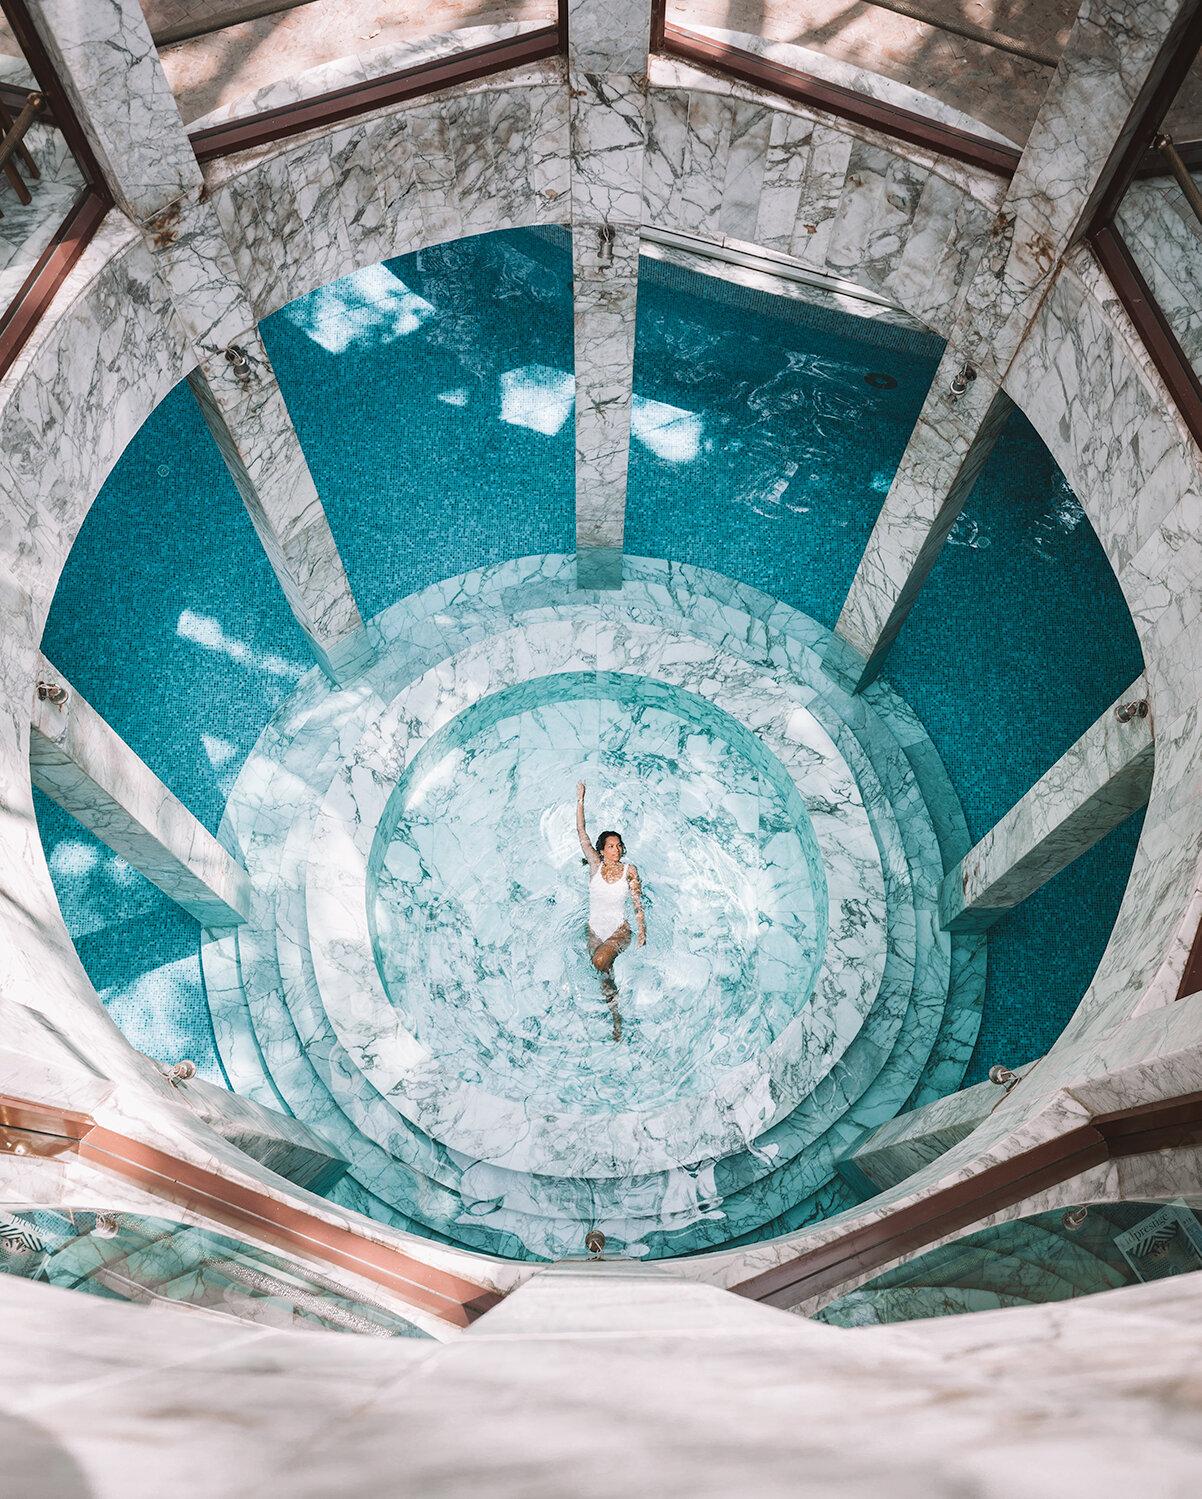 marrakech essential travel guide best hotels to stay es saadi resort